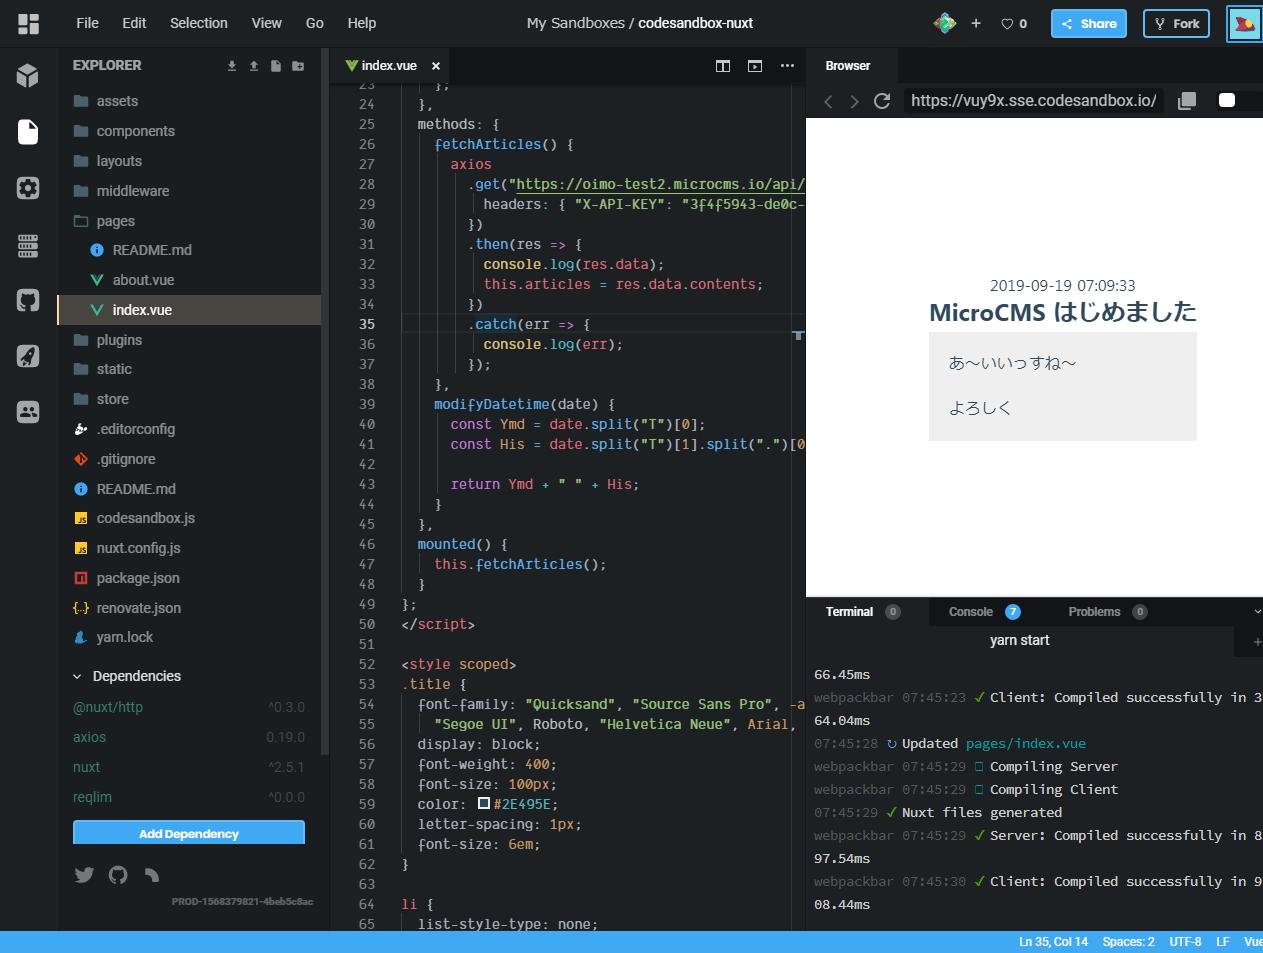 codesandbox-nuxt - CodeSandbox.png